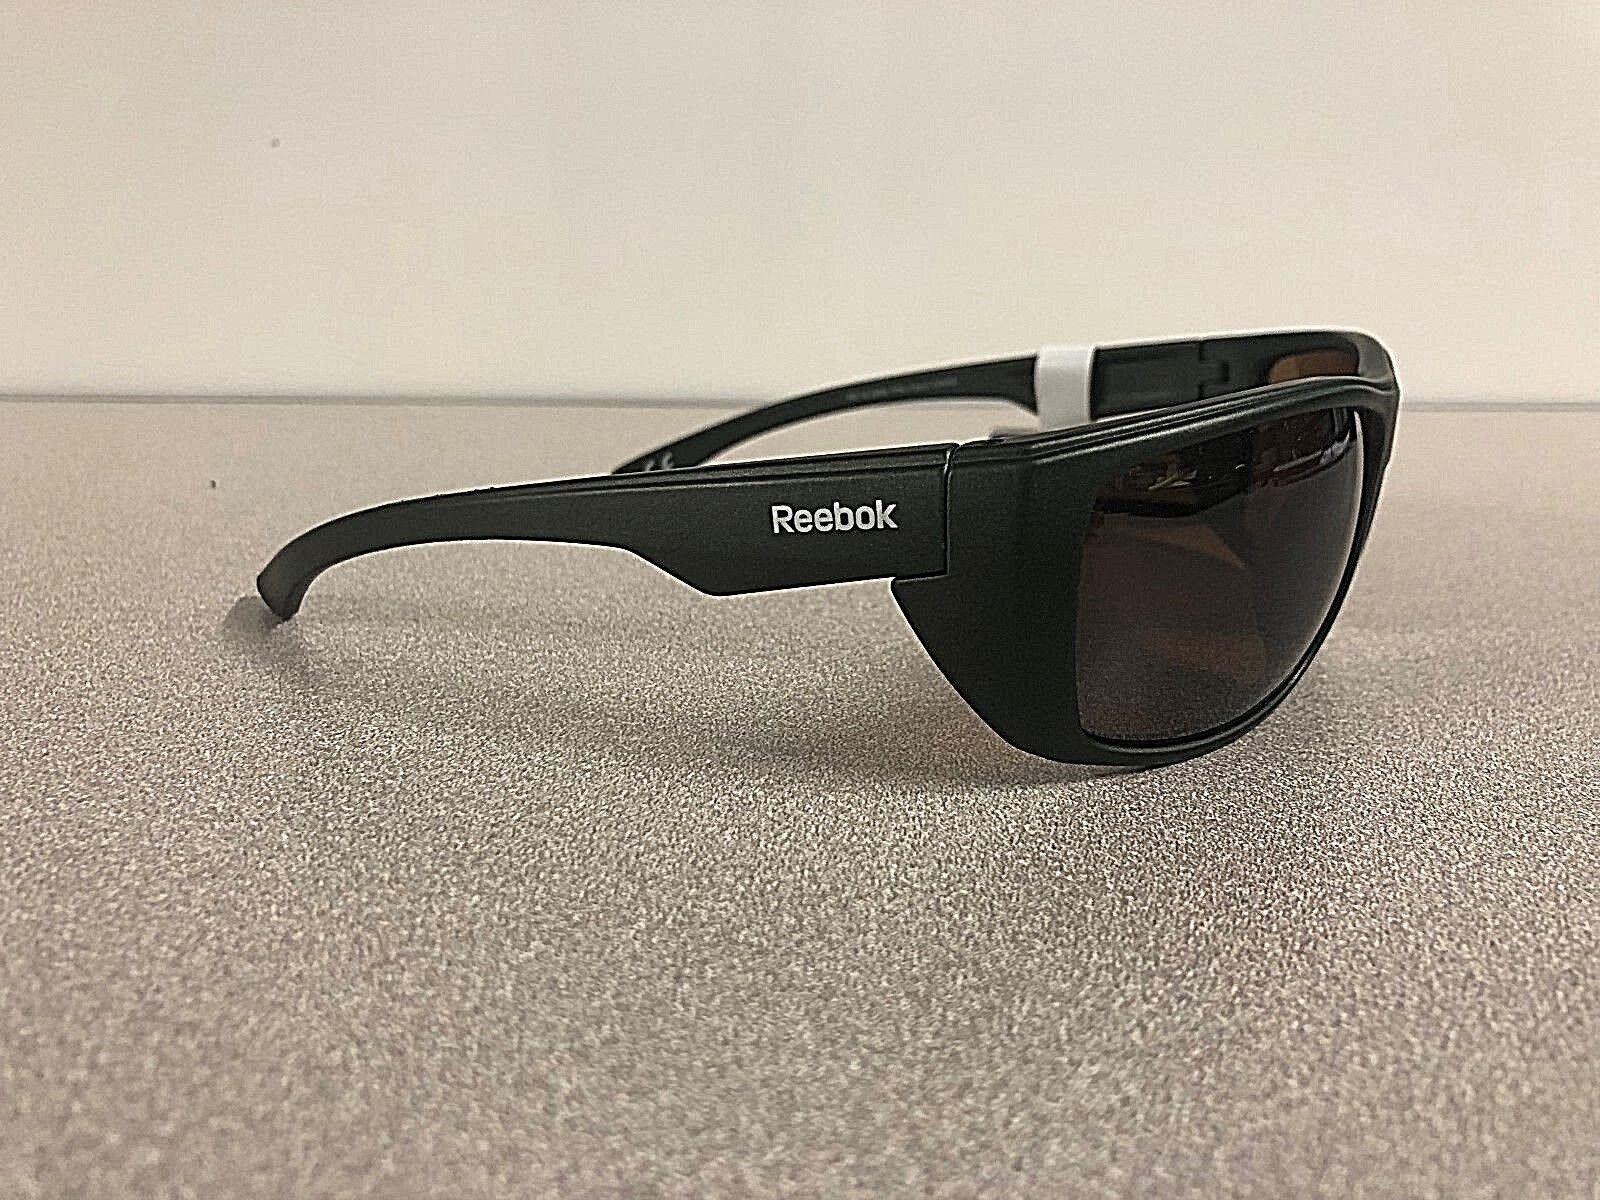 8c3f07cd328 ... New Reebok Mens  Cycling Golf Wrap Sport Polarized Lens Sunglasses  Green Frame фото ...